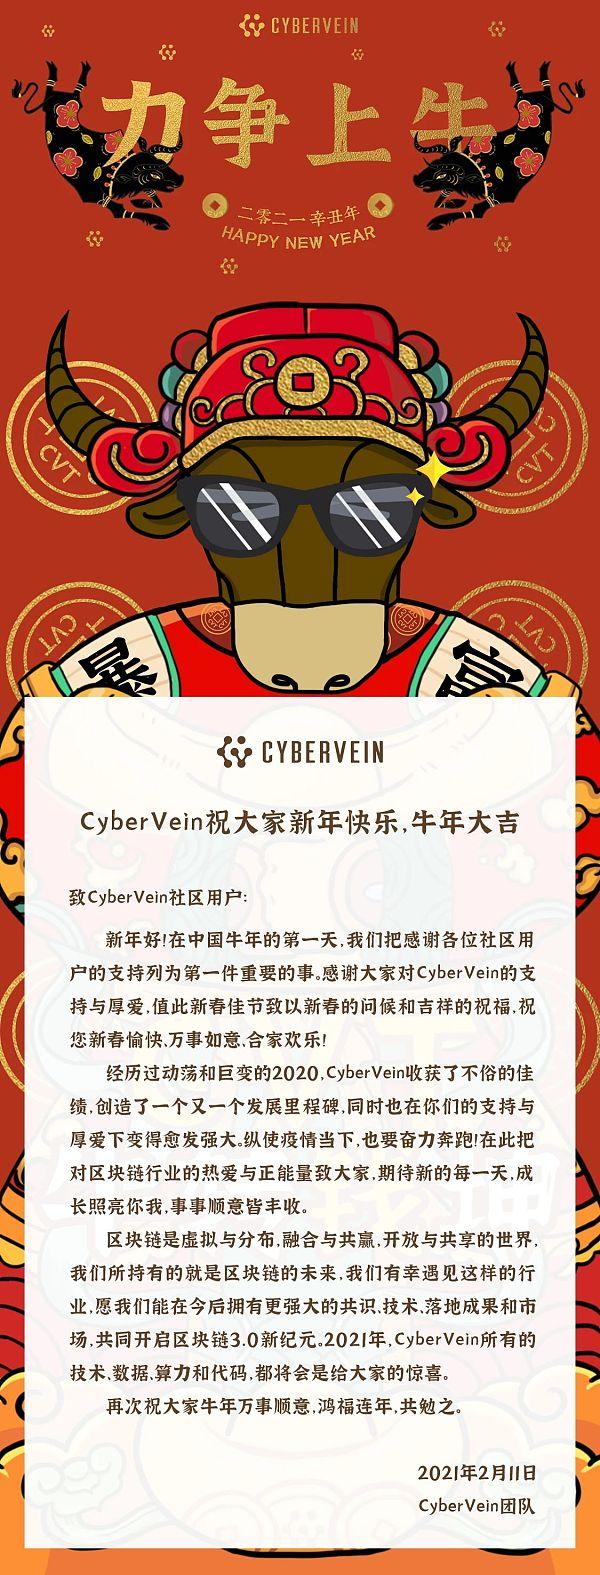 "CyberVein恭祝大家新年快乐 ""牛年大吉"""